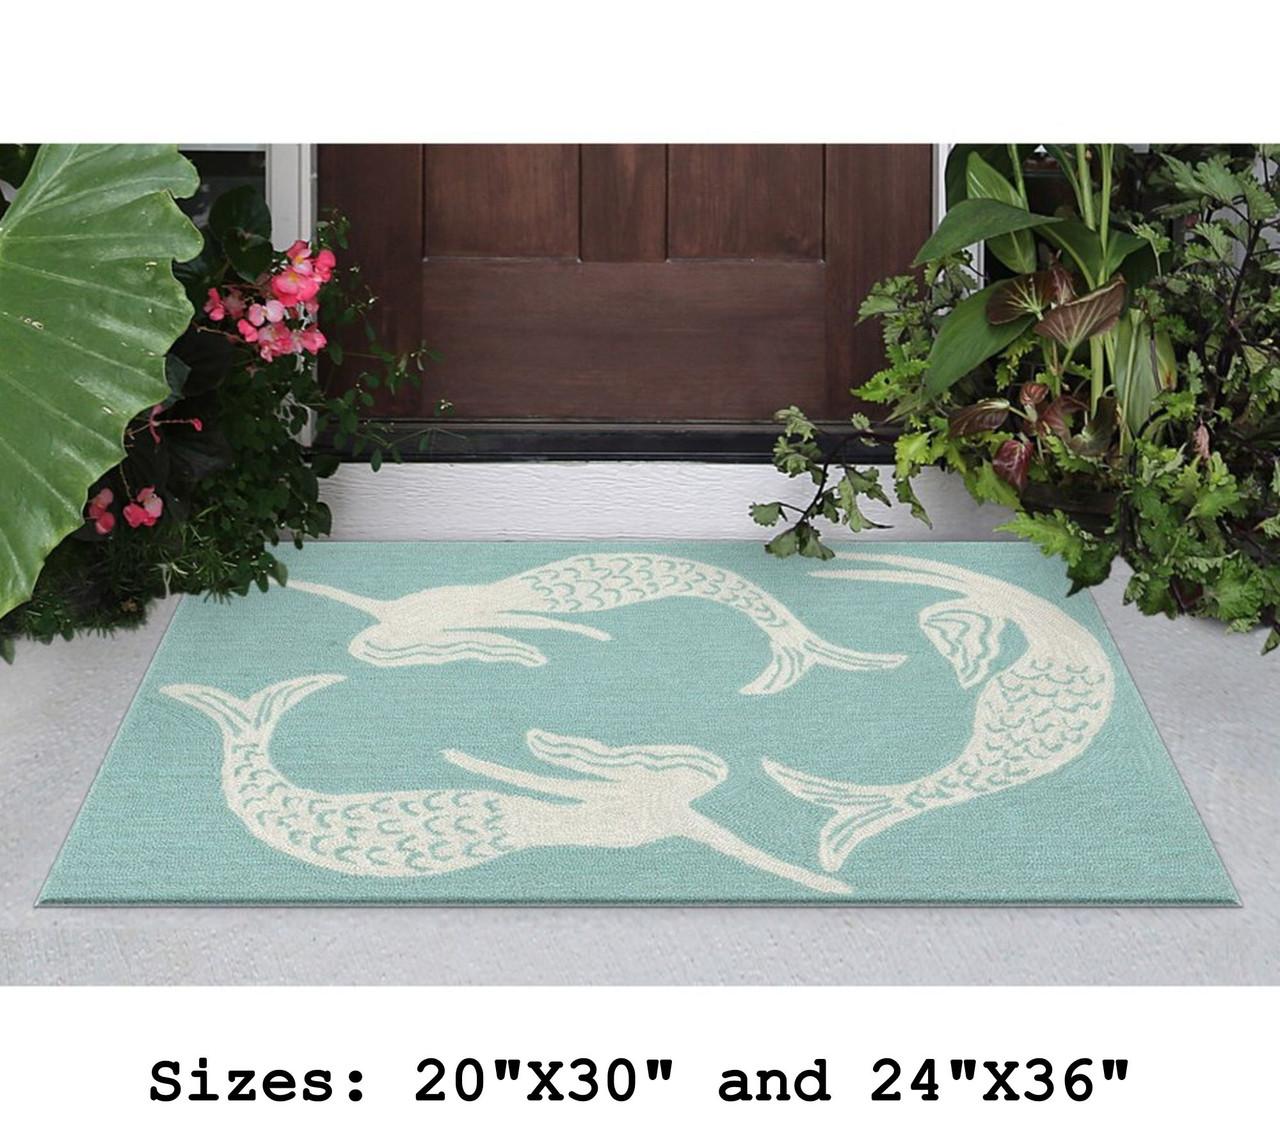 Aqua Capri Mermaids Indoor/Outdoor Rug -  Small Rectangle  Lifestyle